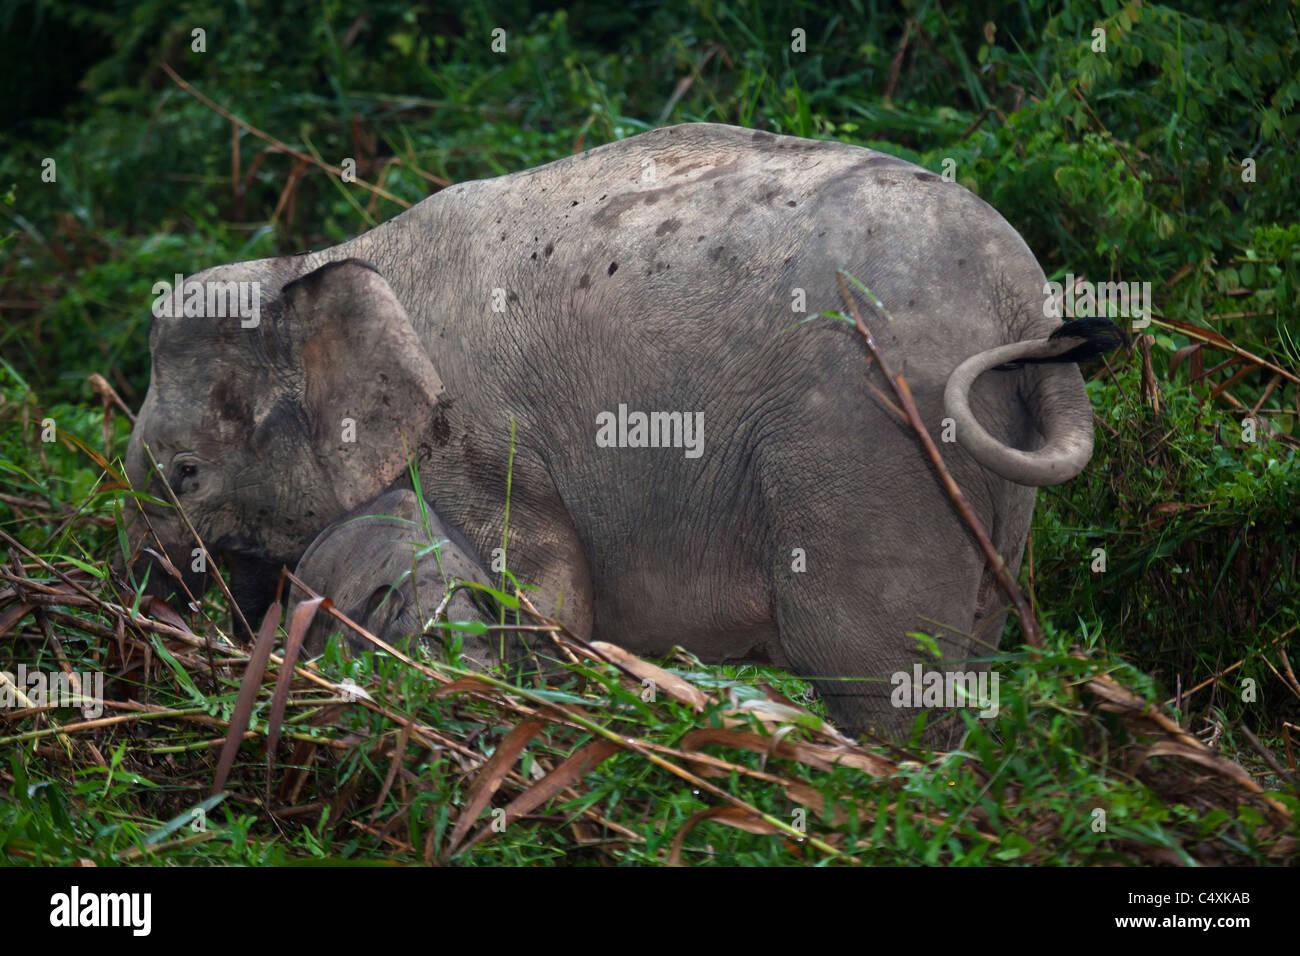 Wild Asian elephant Borneo cow with small calf pygmy elephants grazing in riverine marshland - Stock Image